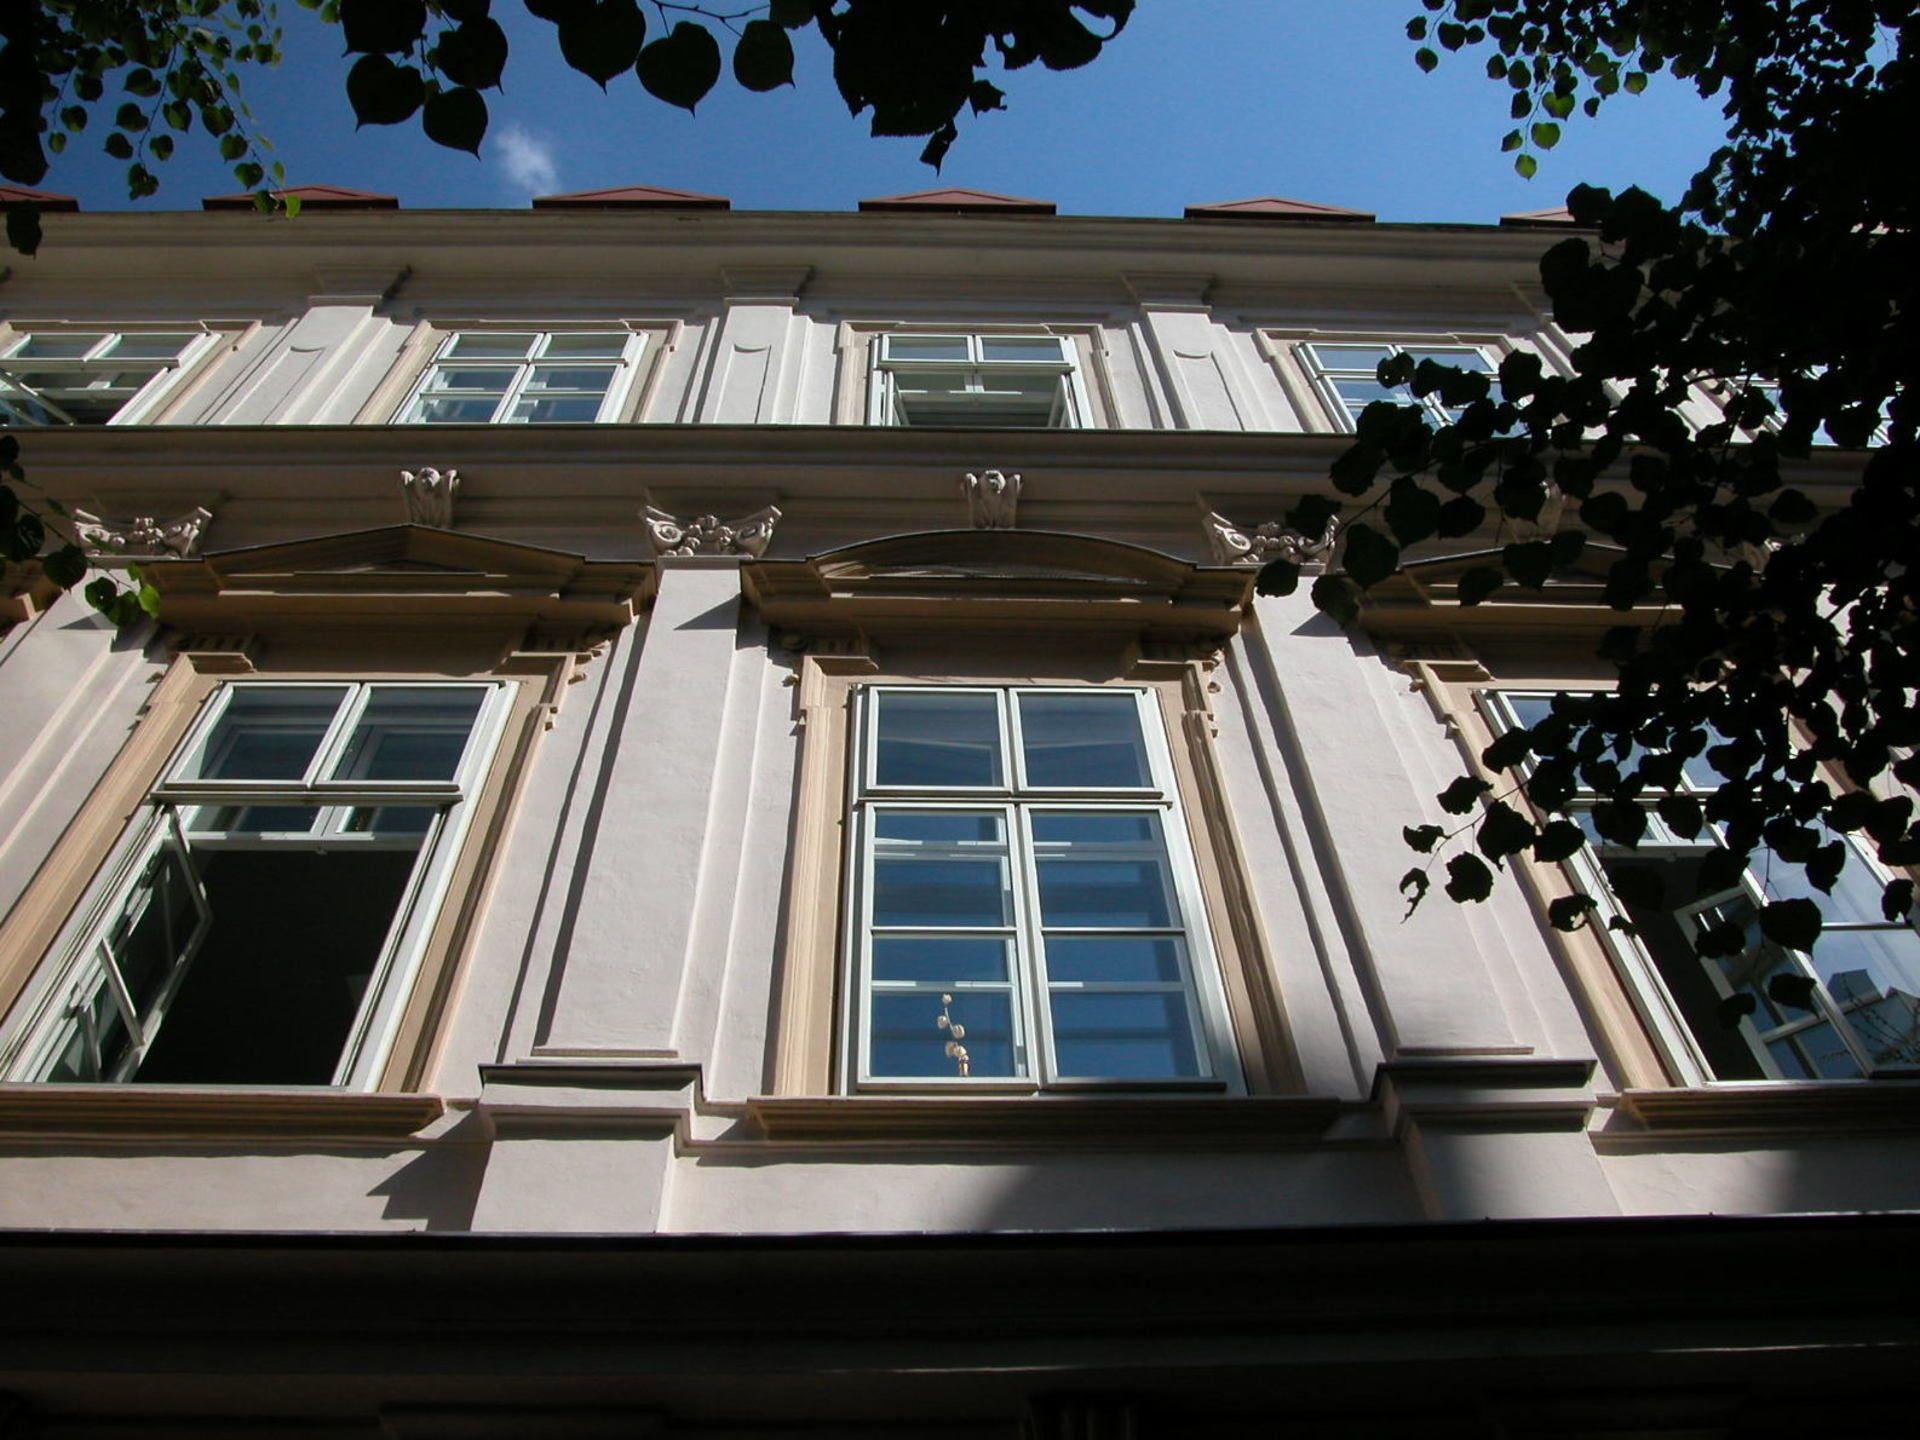 Wallnerstraße 8 - Palais Caprara-Geymüller, 1010 Wien